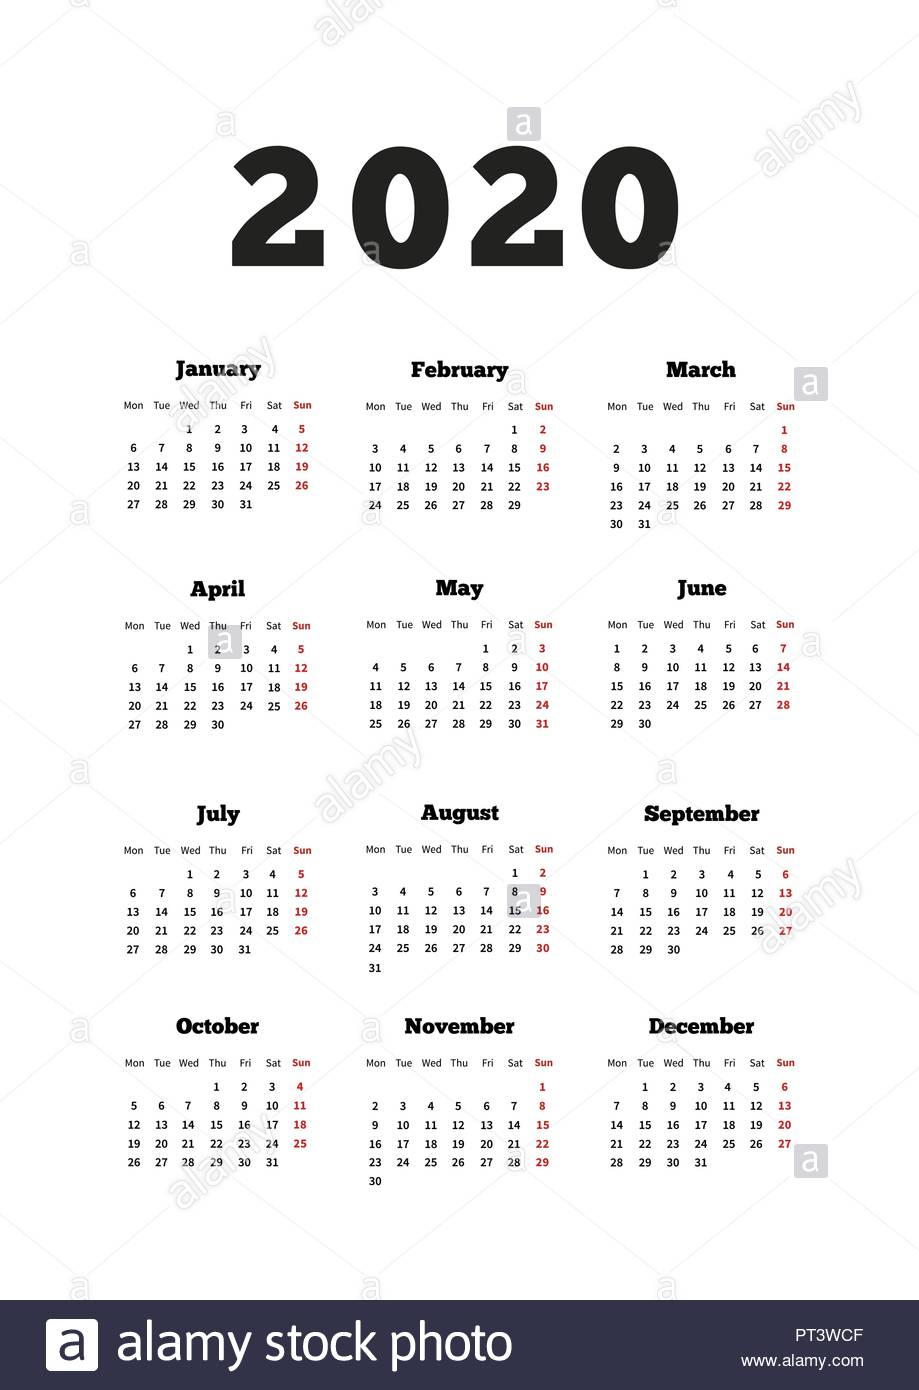 Anno Calendario 2020.Https E W Trading Com Calendar 2019 Raya 2019 08 05t09